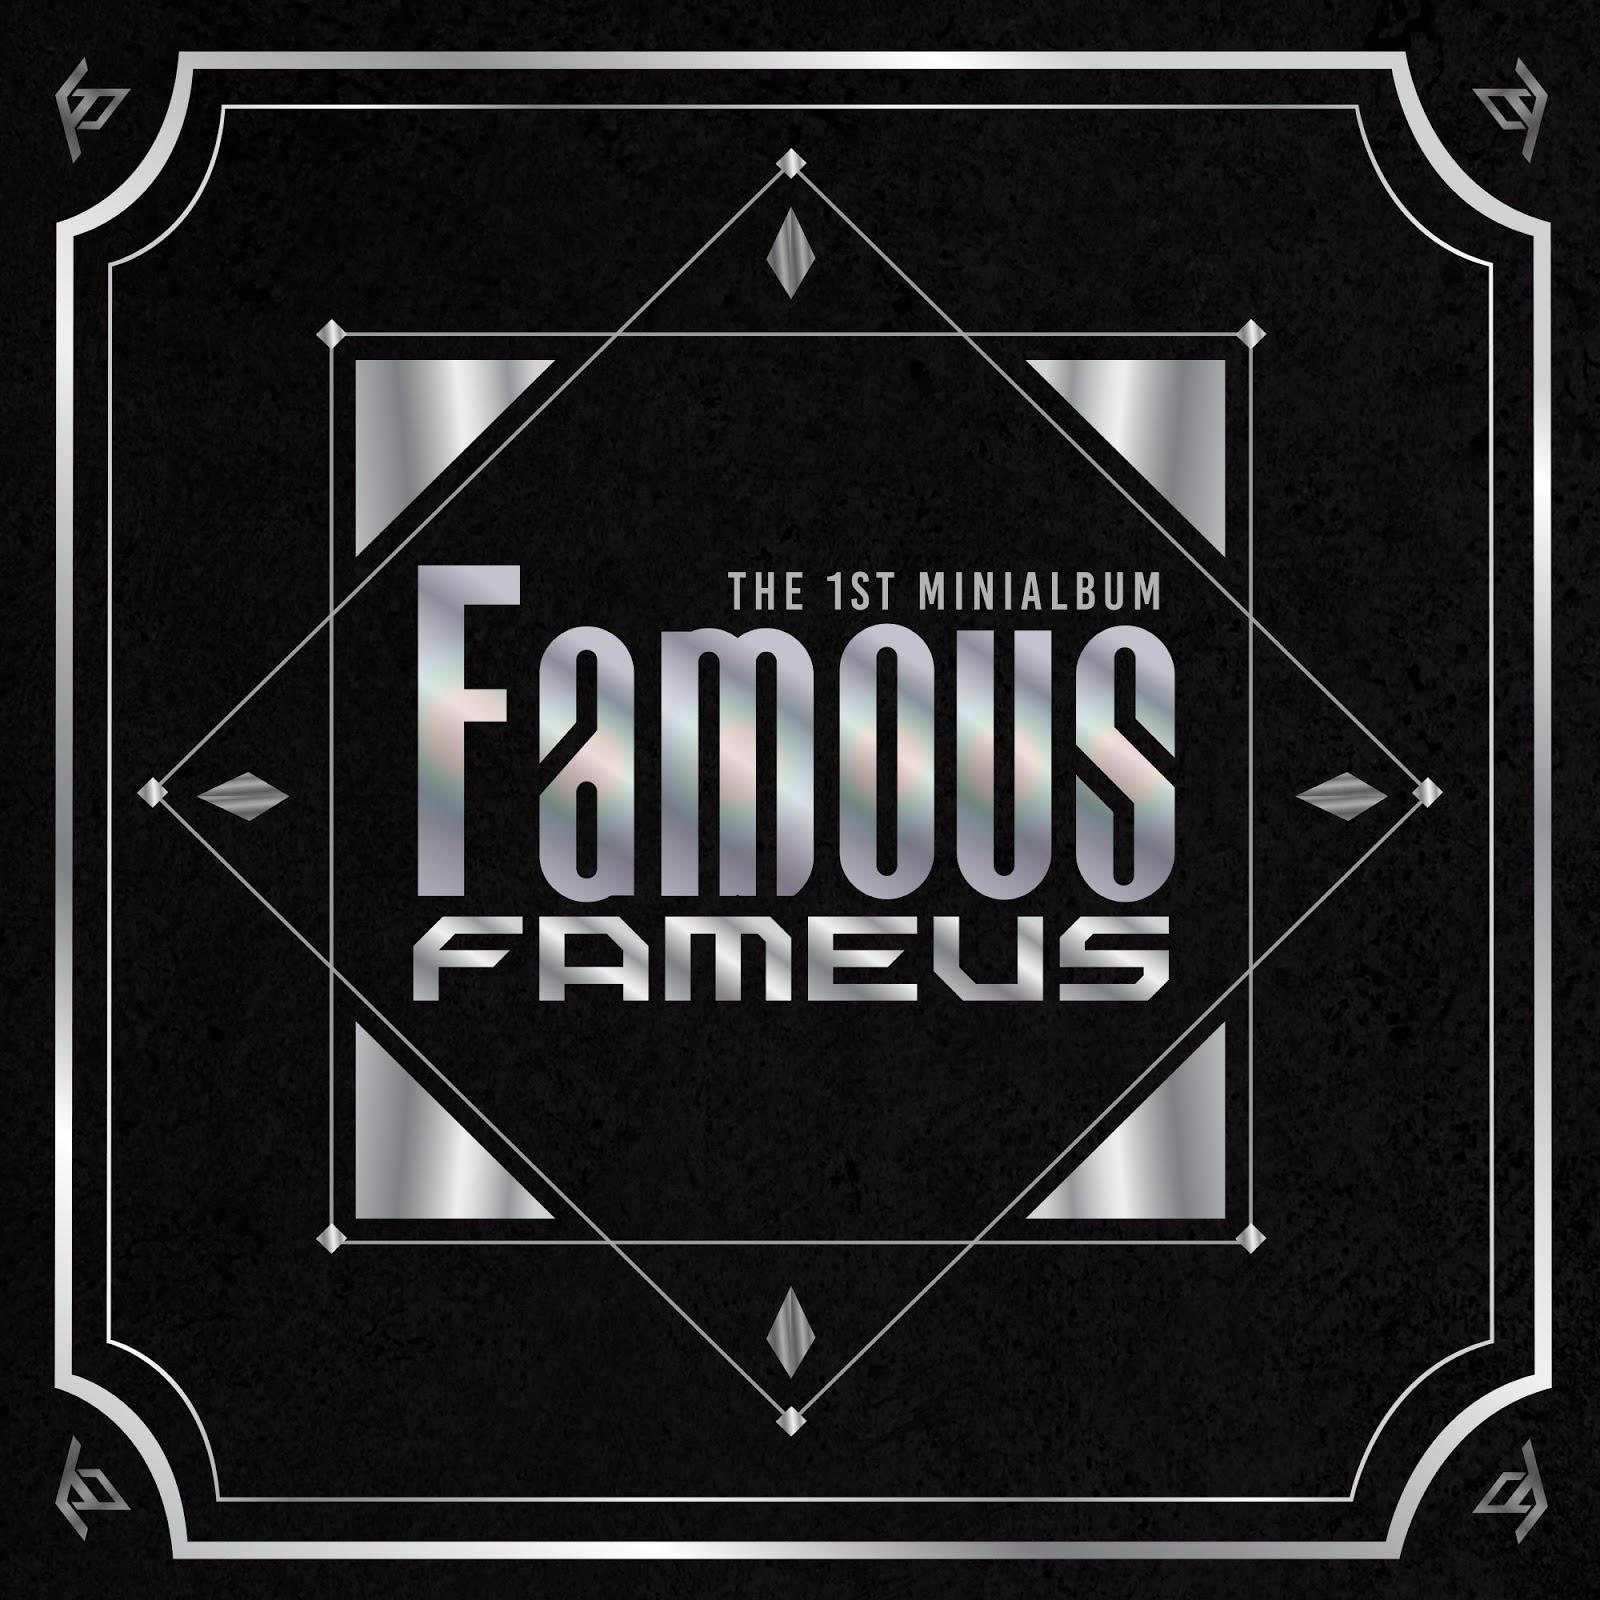 [Mini Album] Famous The 1st Mini Album - Fame Us